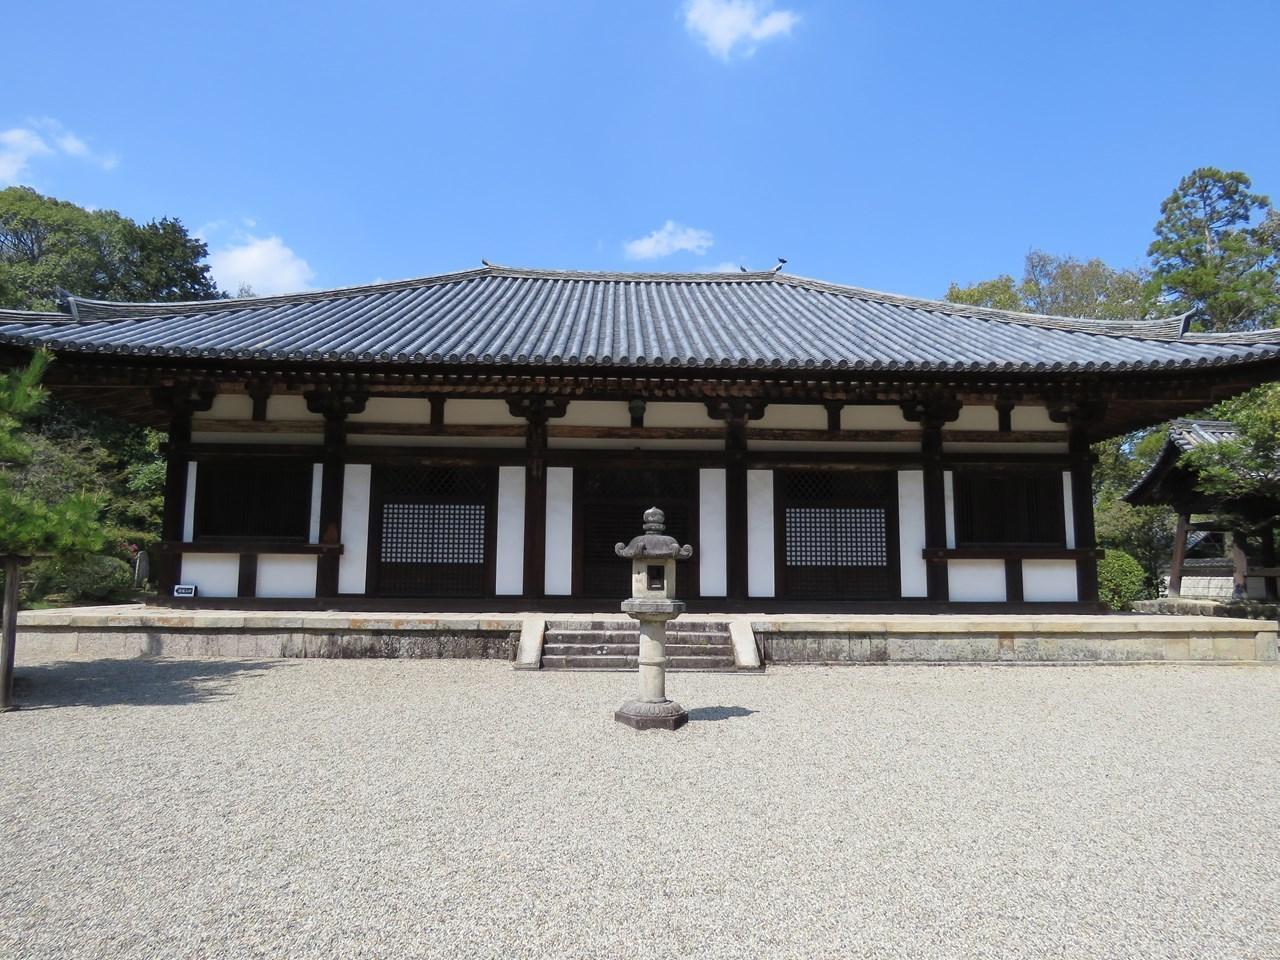 s-秋篠寺 本堂(国宝)